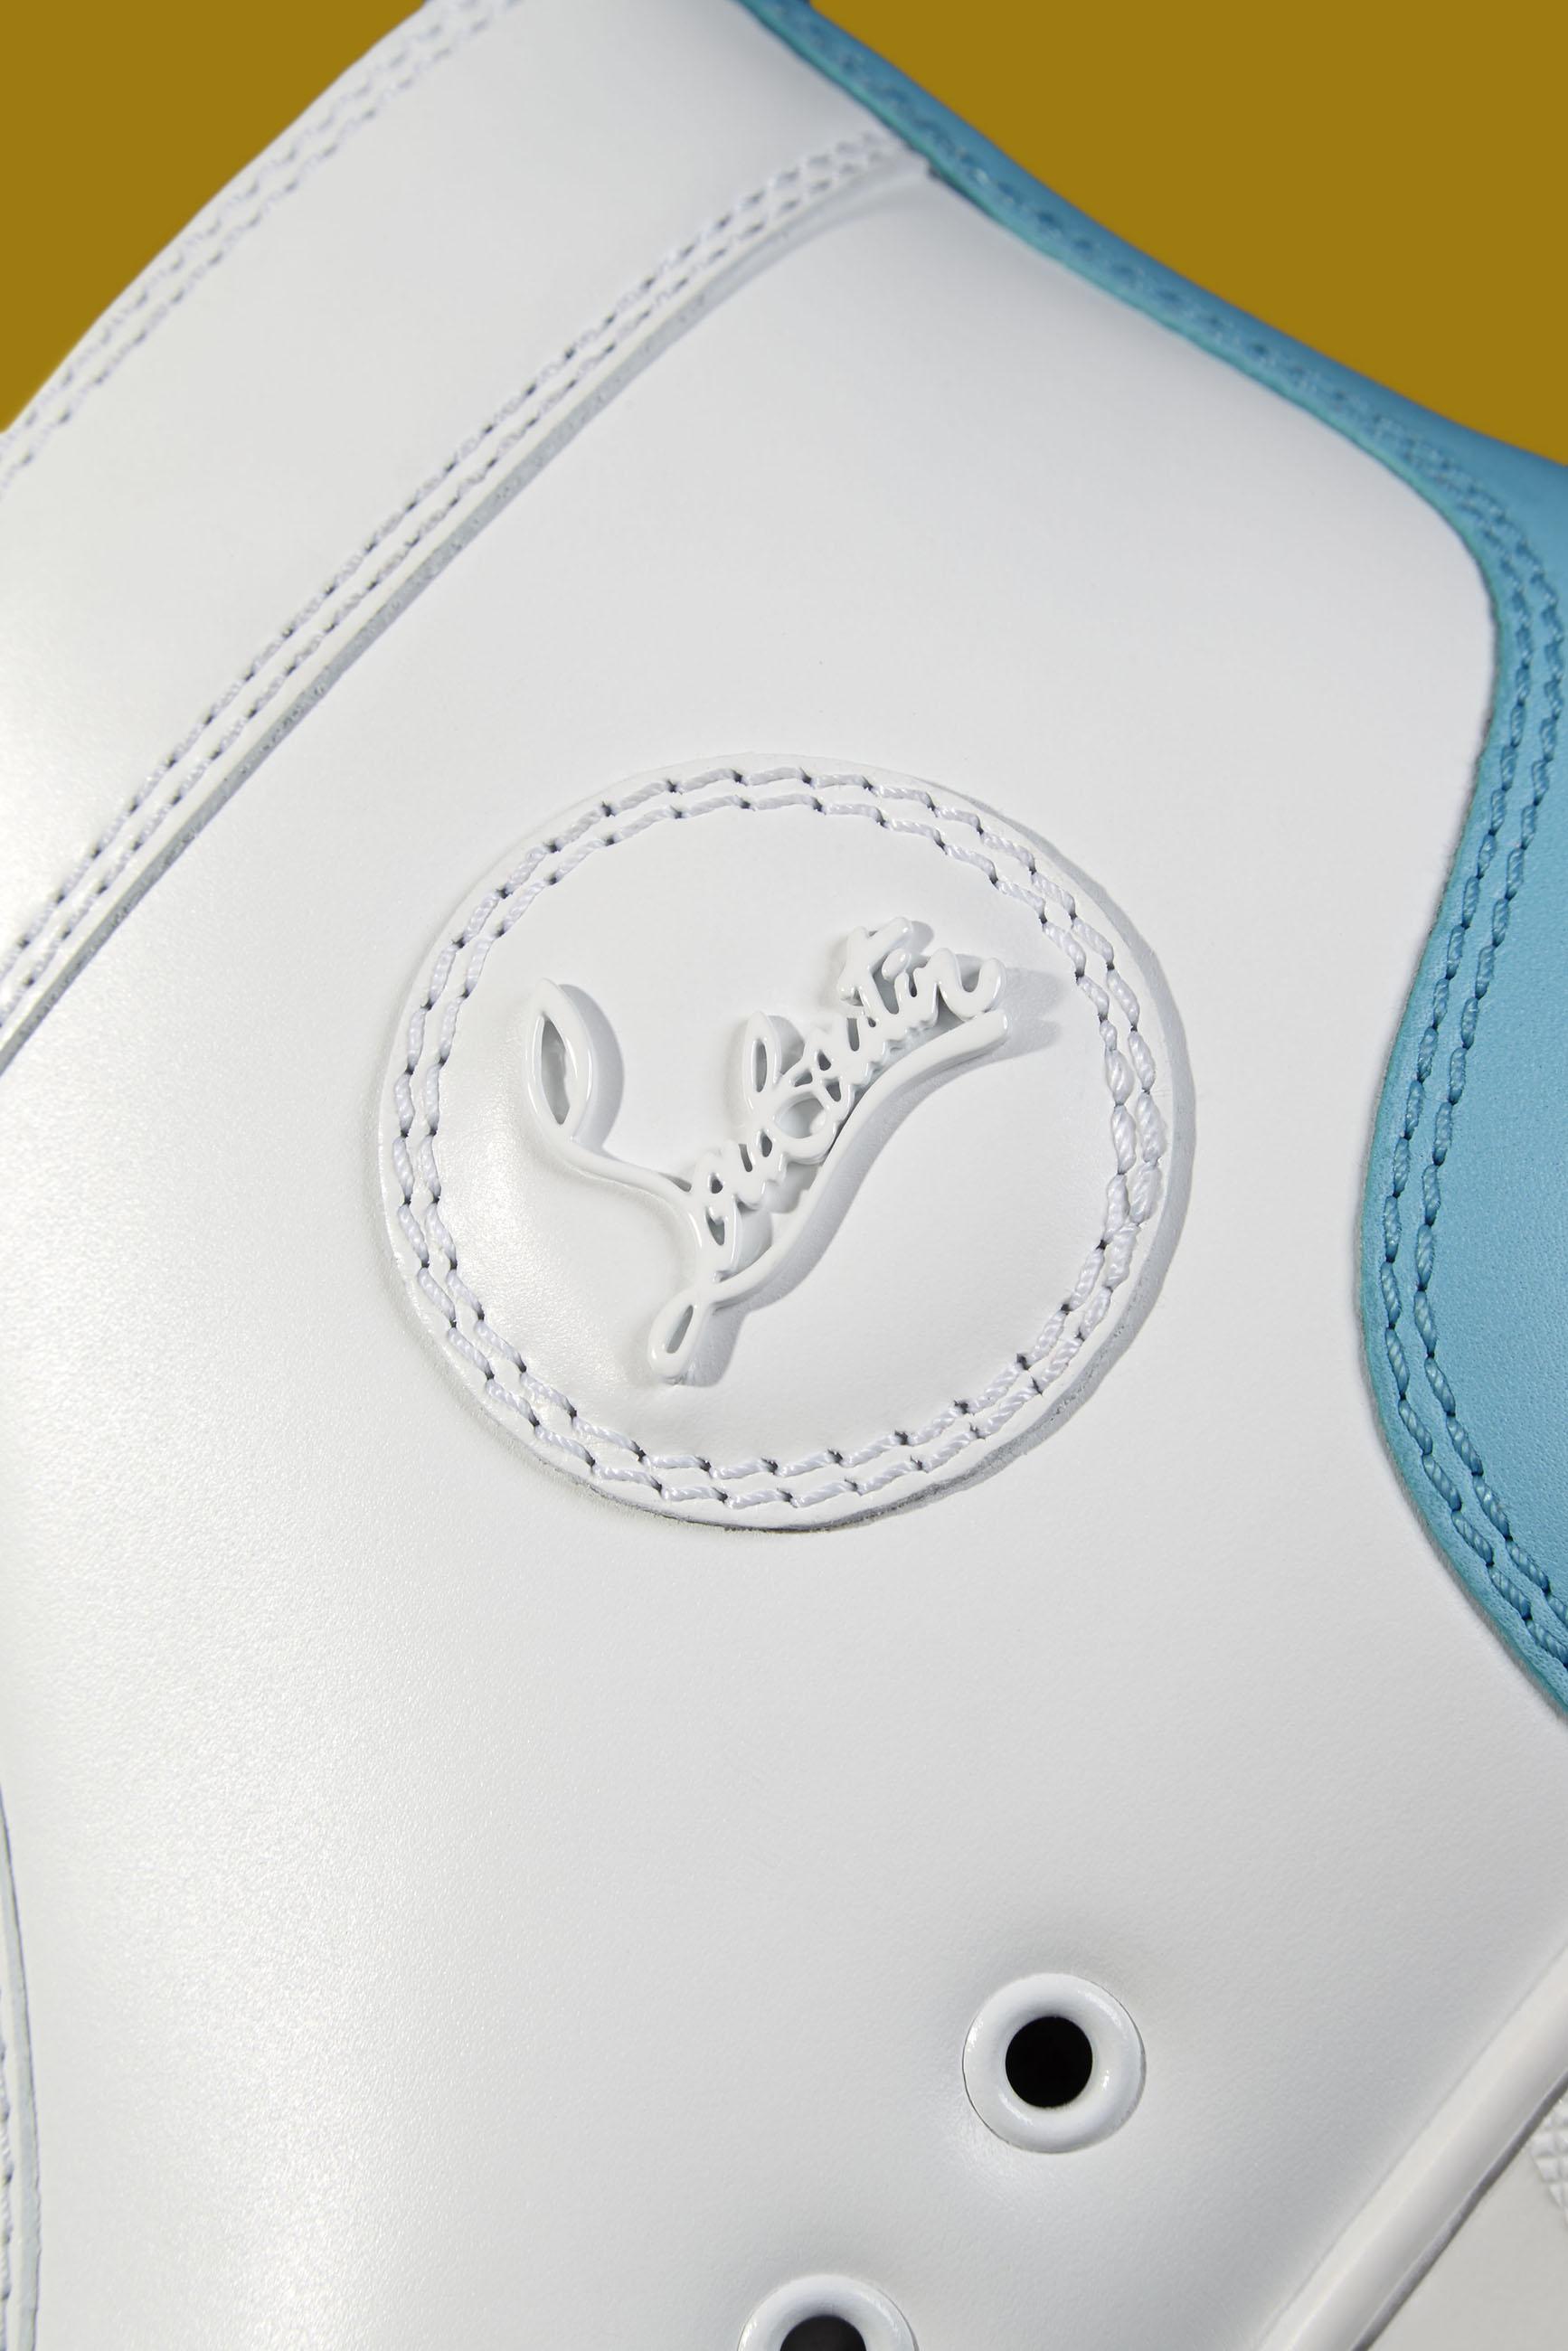 grand choix de b6951 39ab3 Sneakers - Christian Louboutin